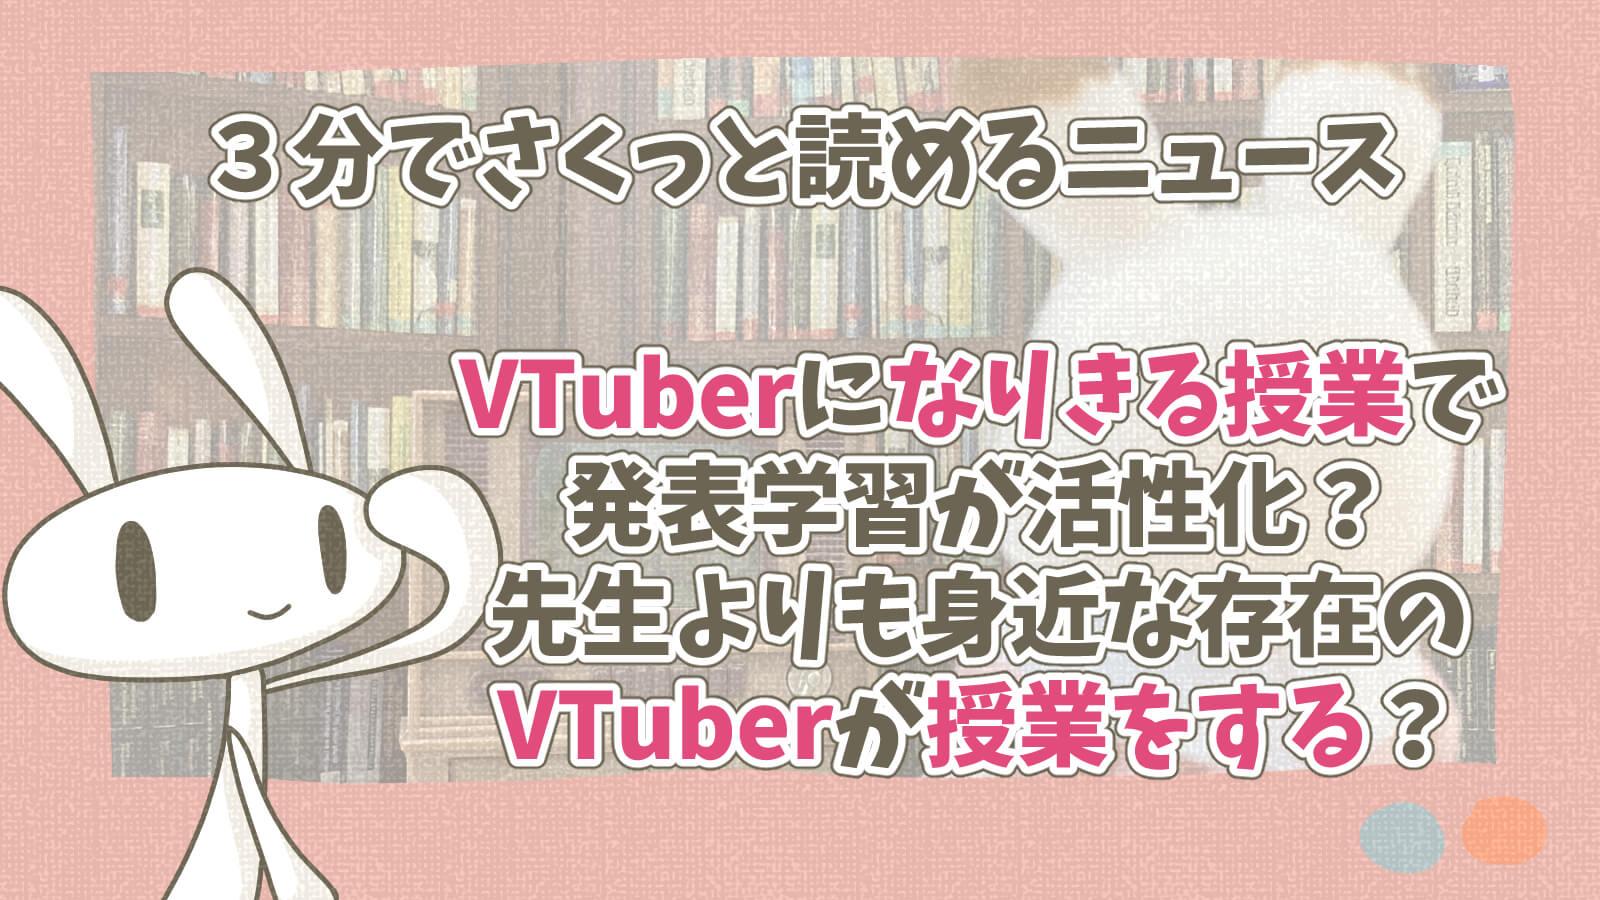 Vtuberがオンライン授業をする教育現場とバーチャルYouTuber